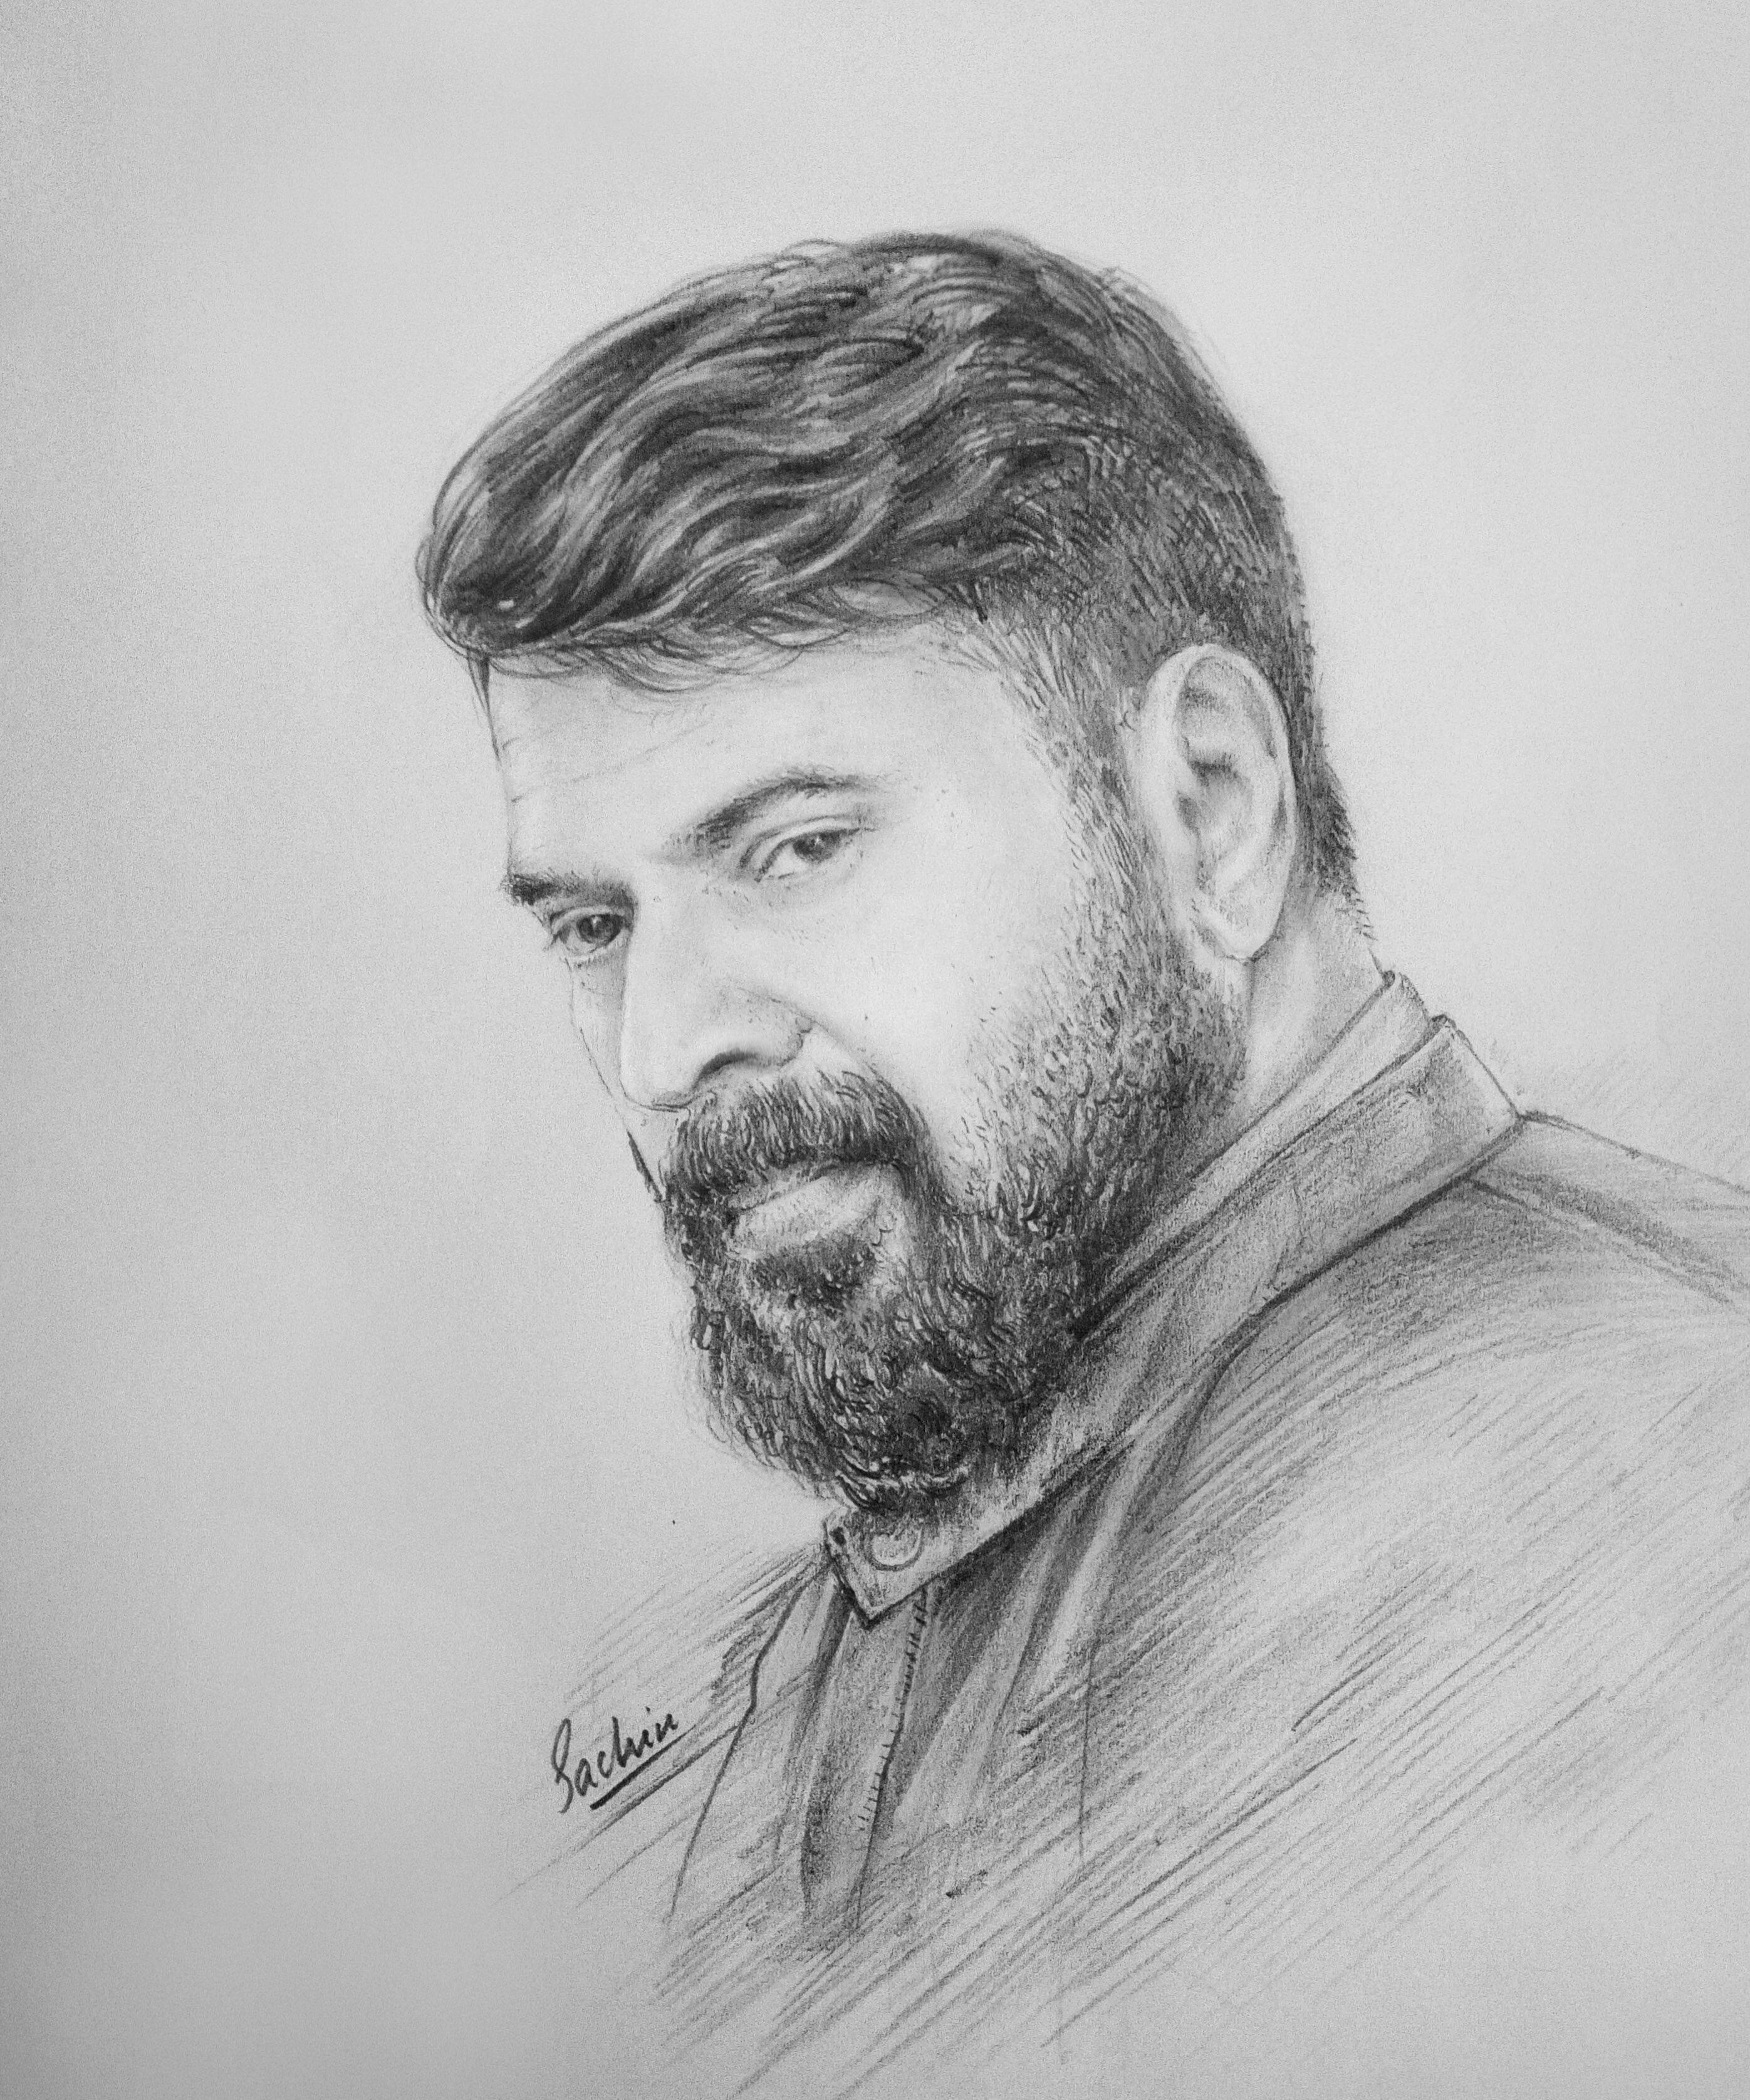 Malayalam Actors Pencil Drawing Images Bestpencildrawing